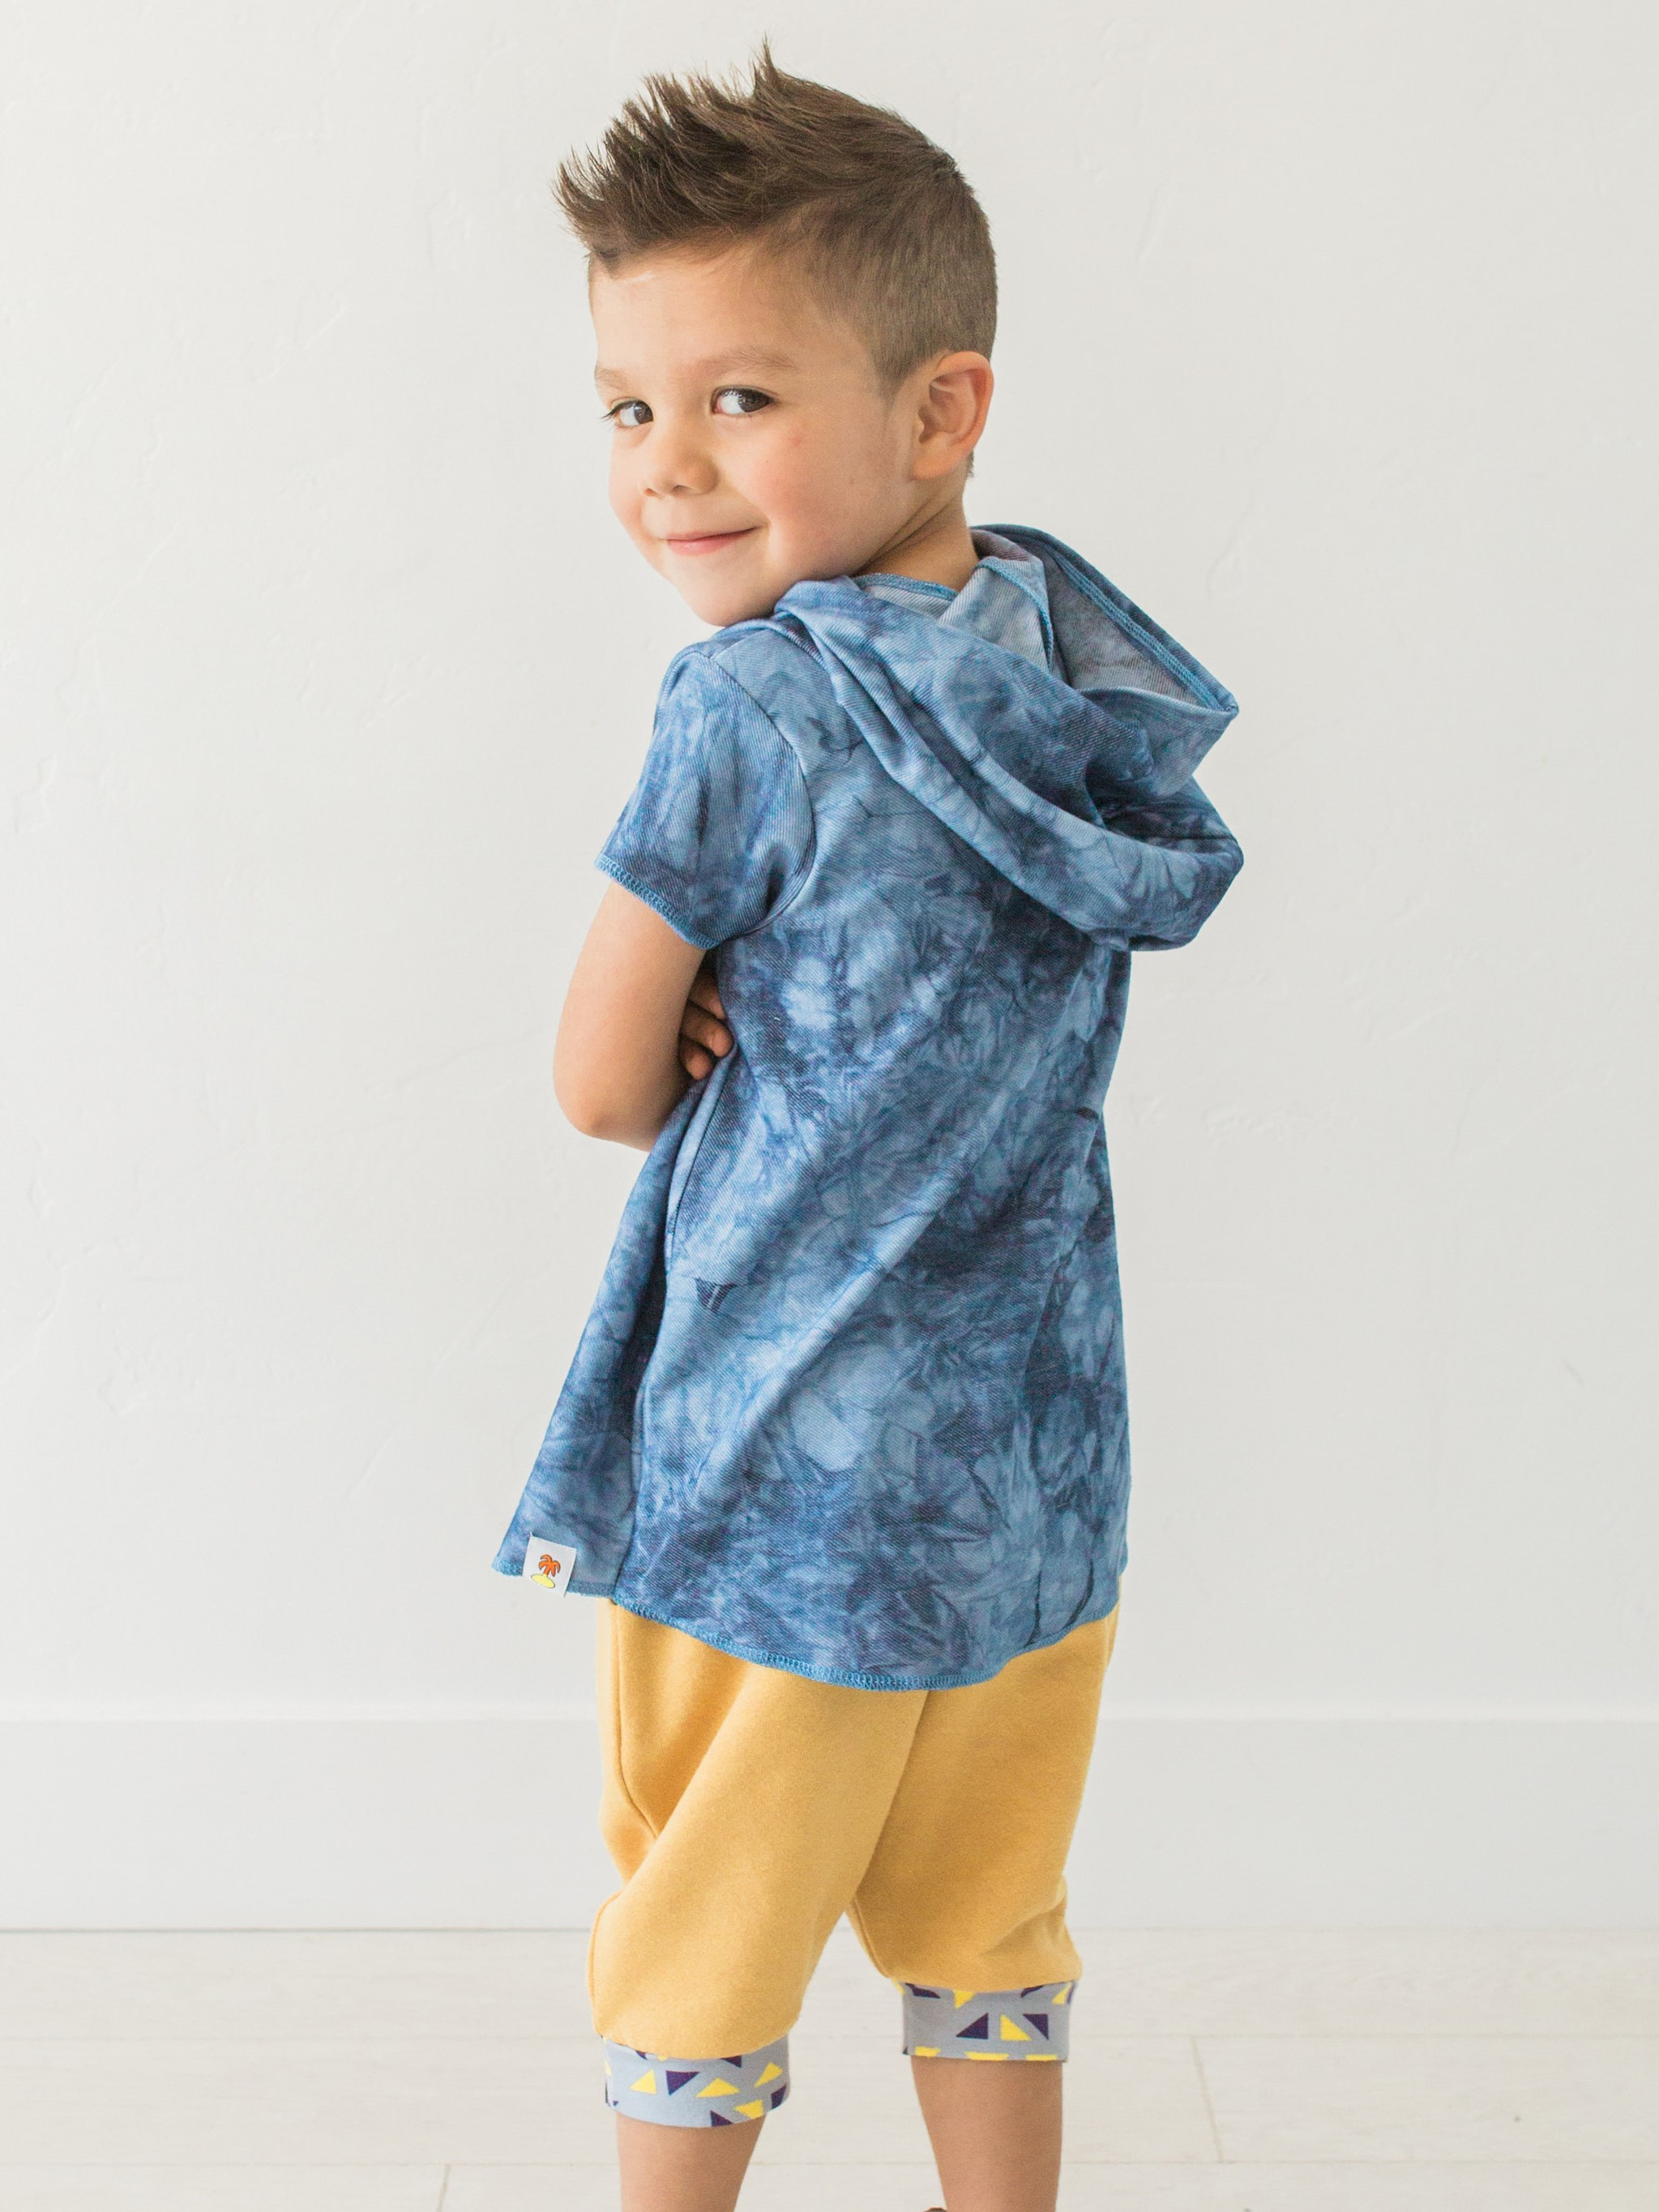 PARADISE KIDS CLOTHING (2)-0591.jpg